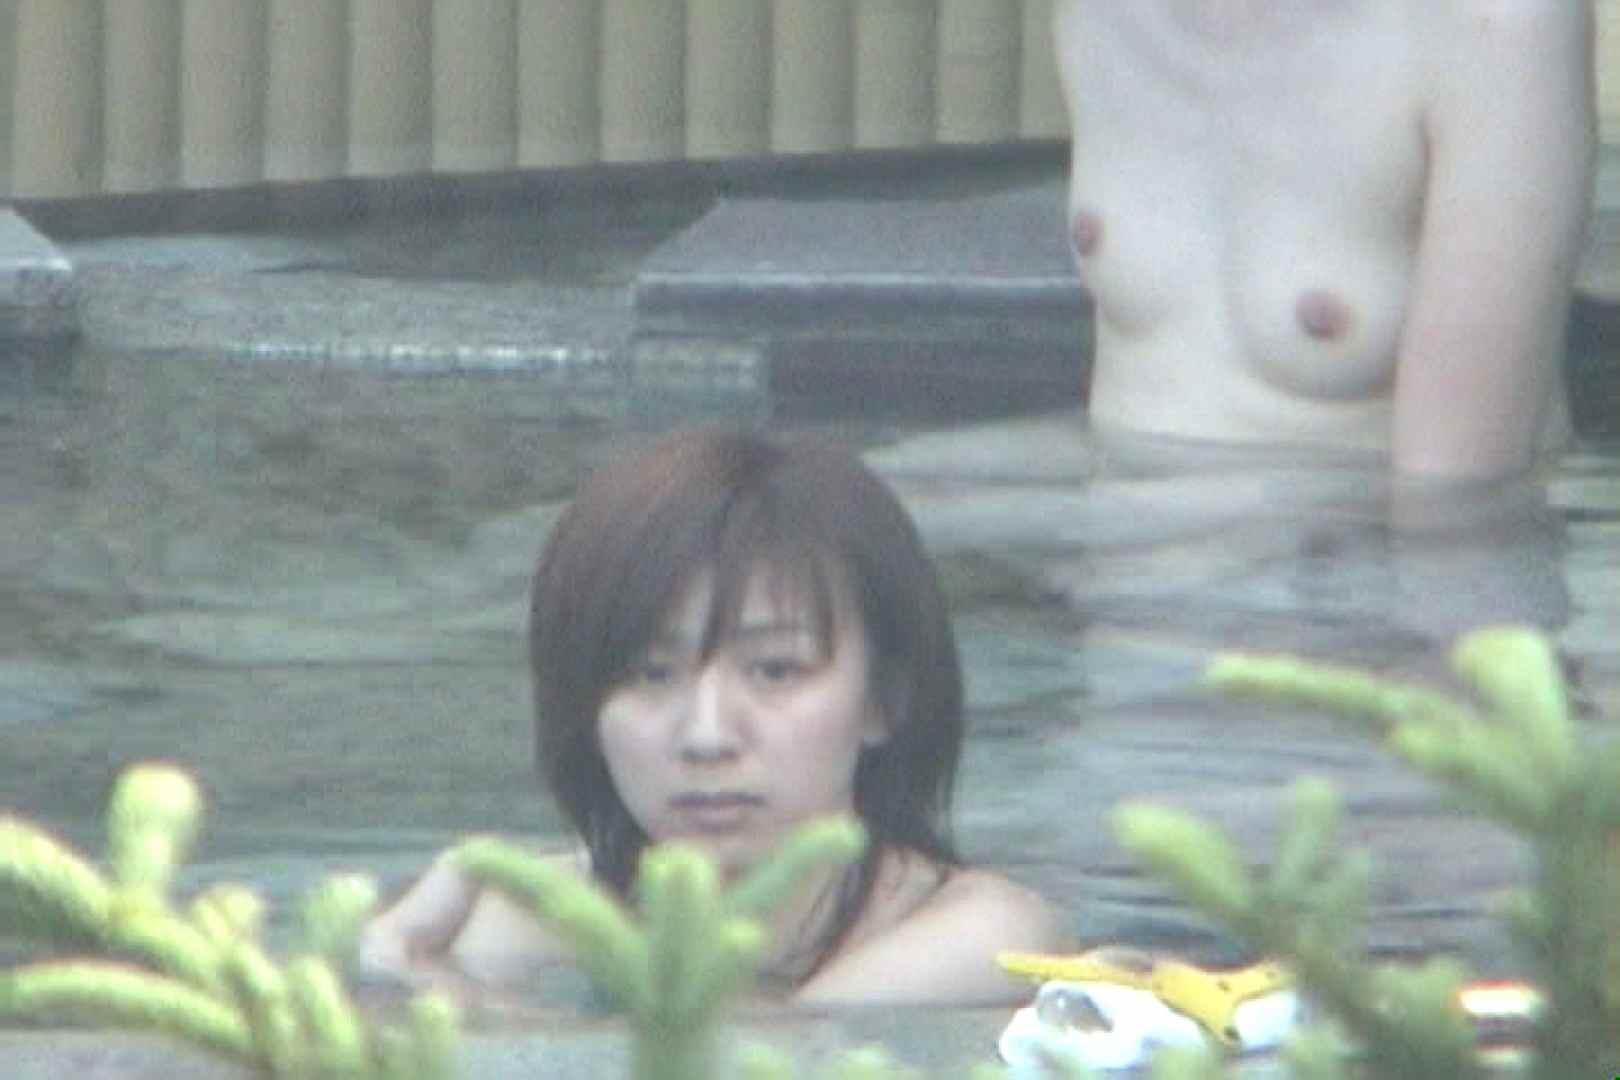 Aquaな露天風呂Vol.77【VIP限定】 露天   盗撮特集  98画像 70